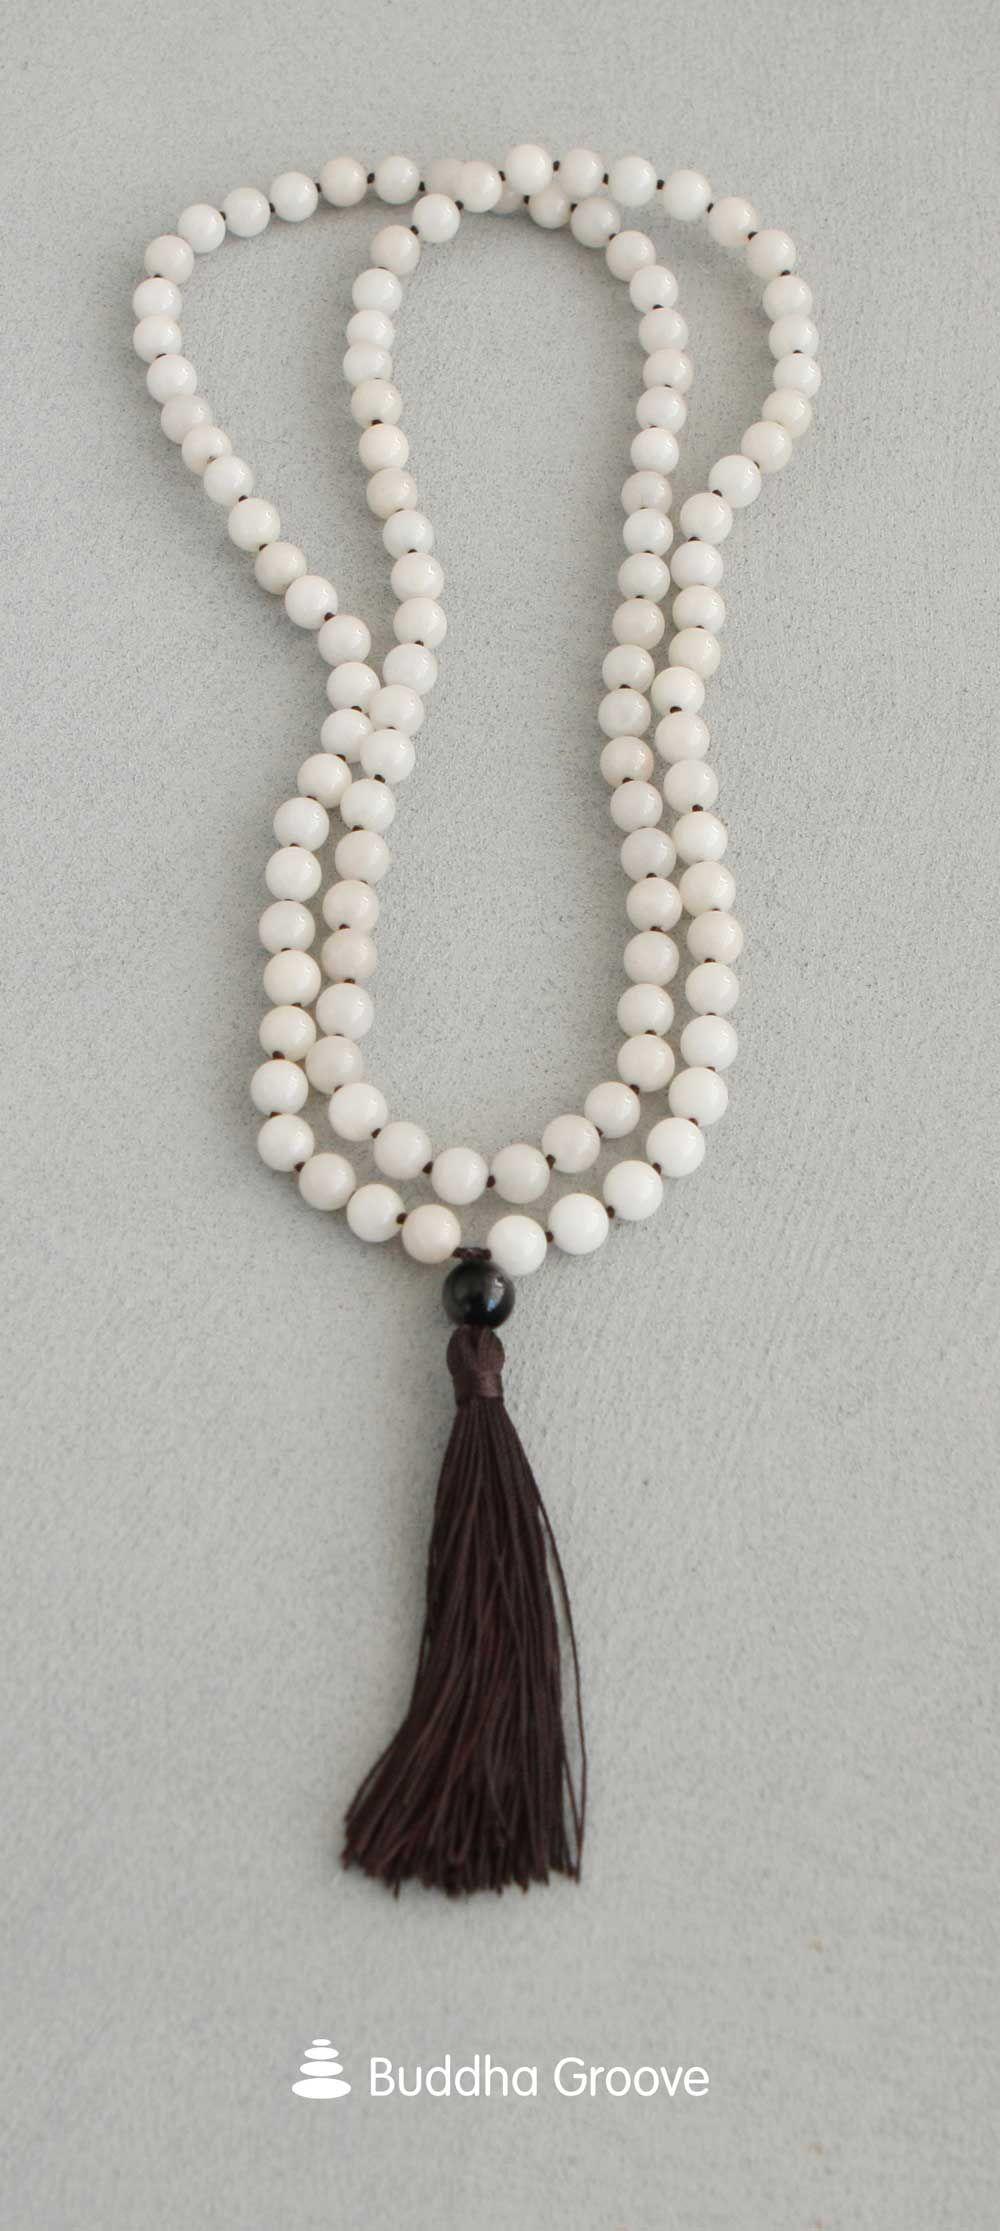 Mala Chain 108 Pearls Cloudy Quartz Gold Onyx Obsidian Achat 6 mm